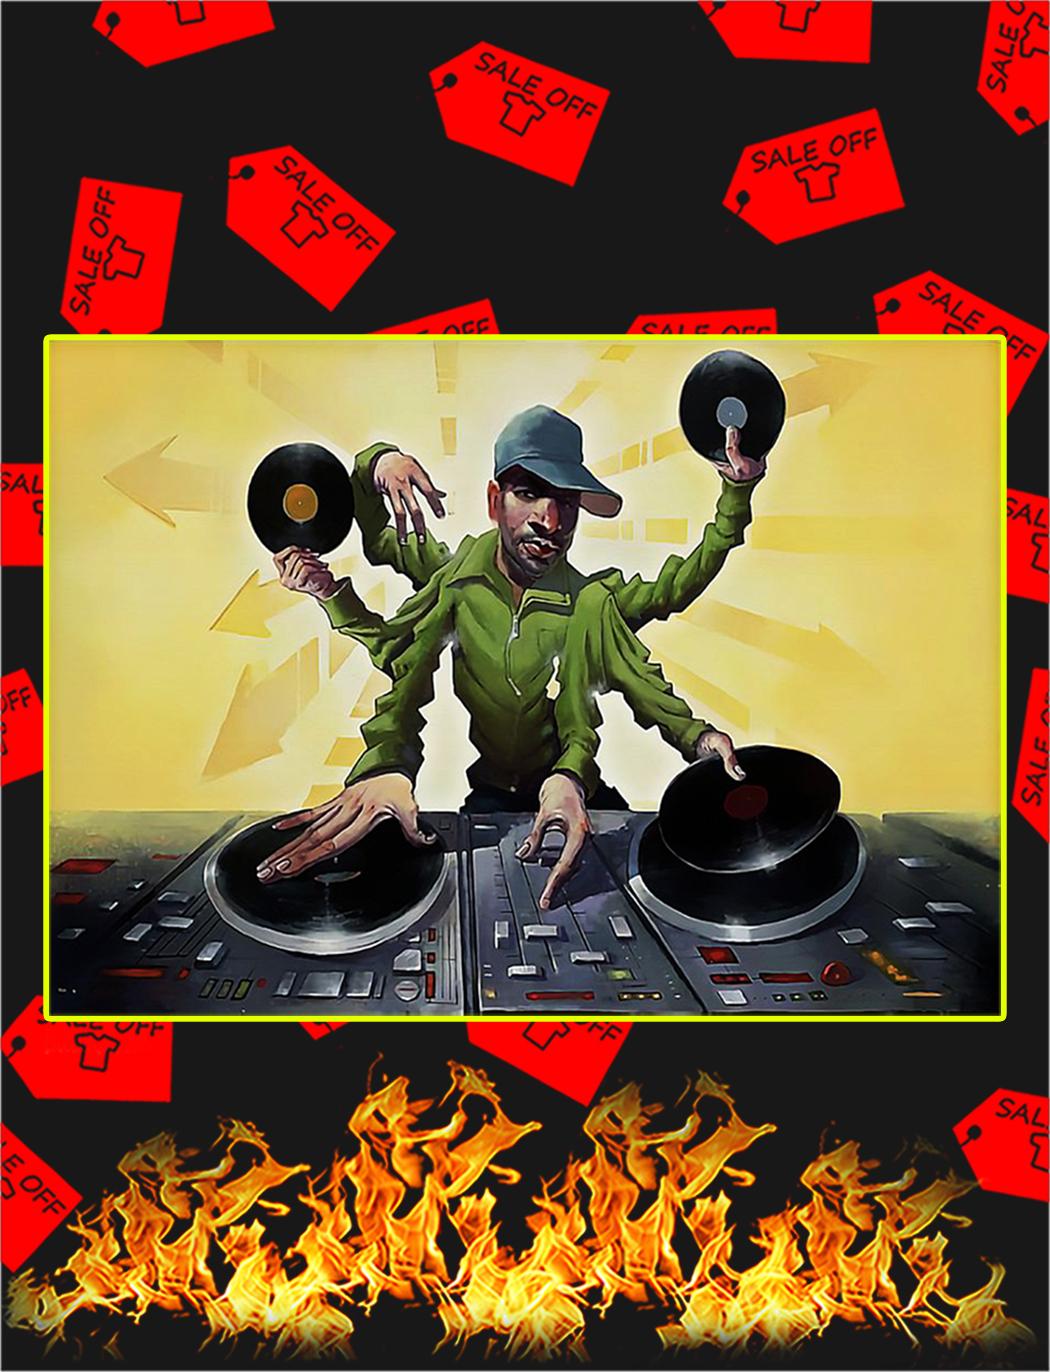 DJ master mixing poster - A1